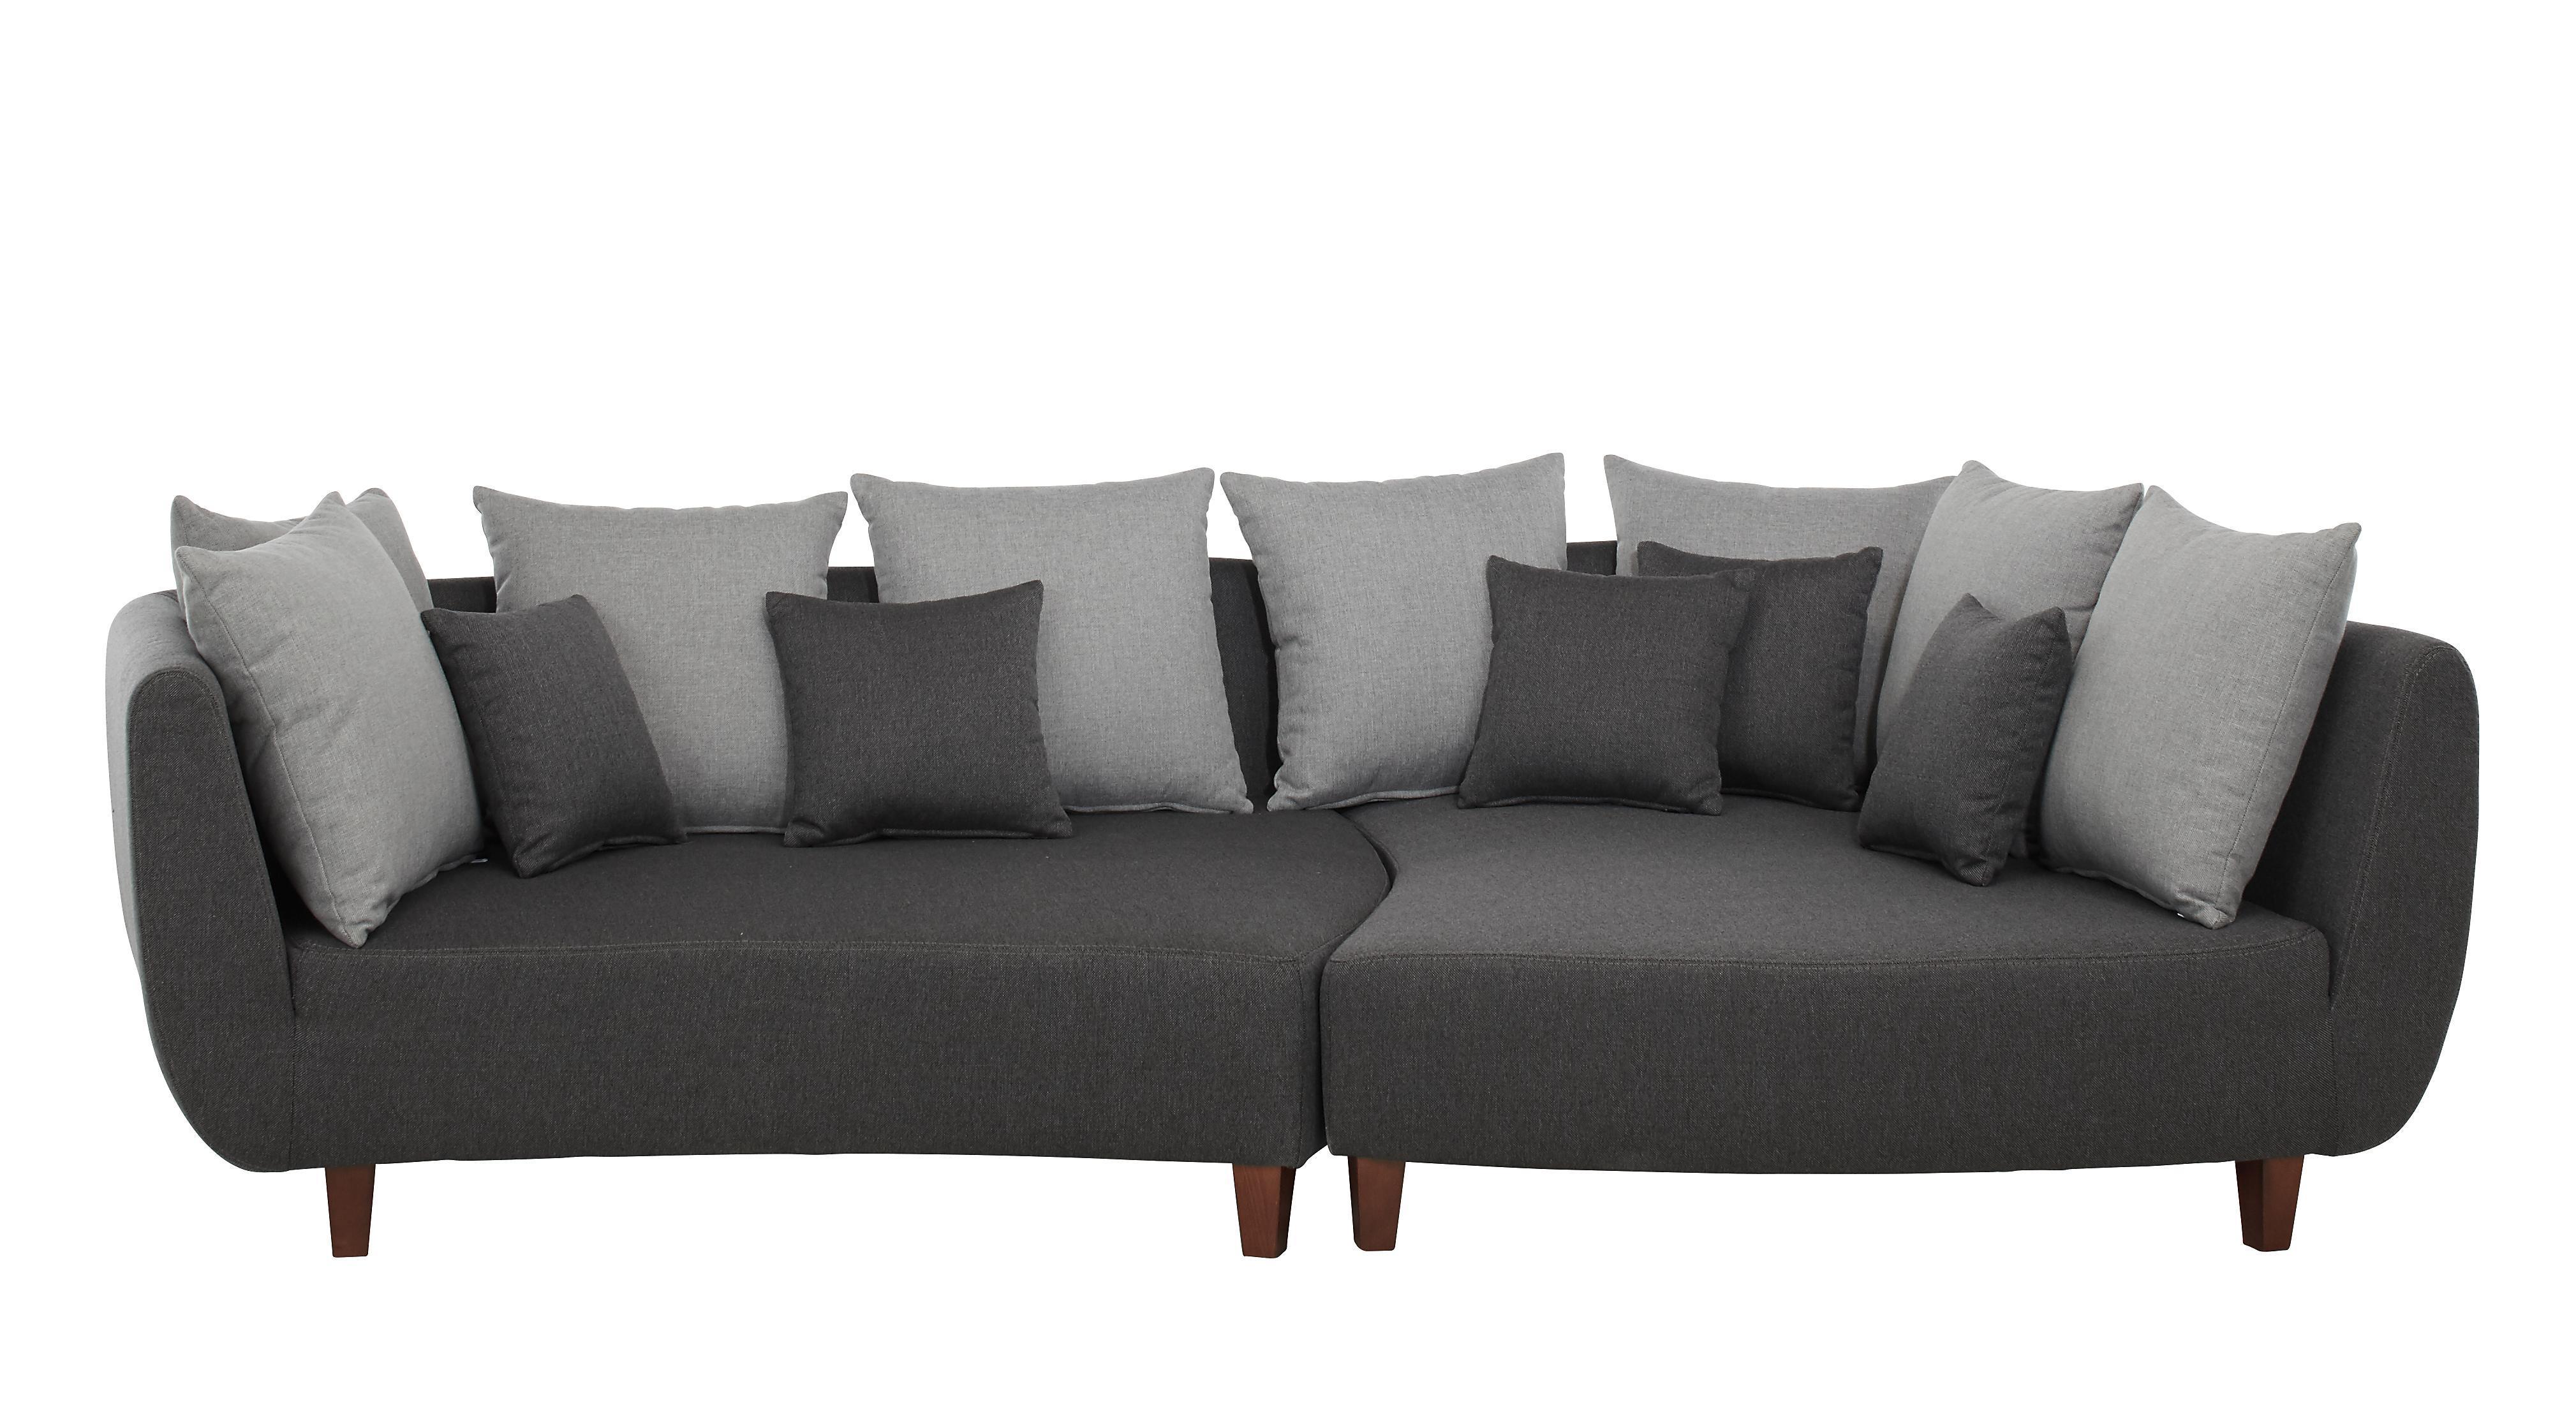 sofa 190 cm breit. Black Bedroom Furniture Sets. Home Design Ideas